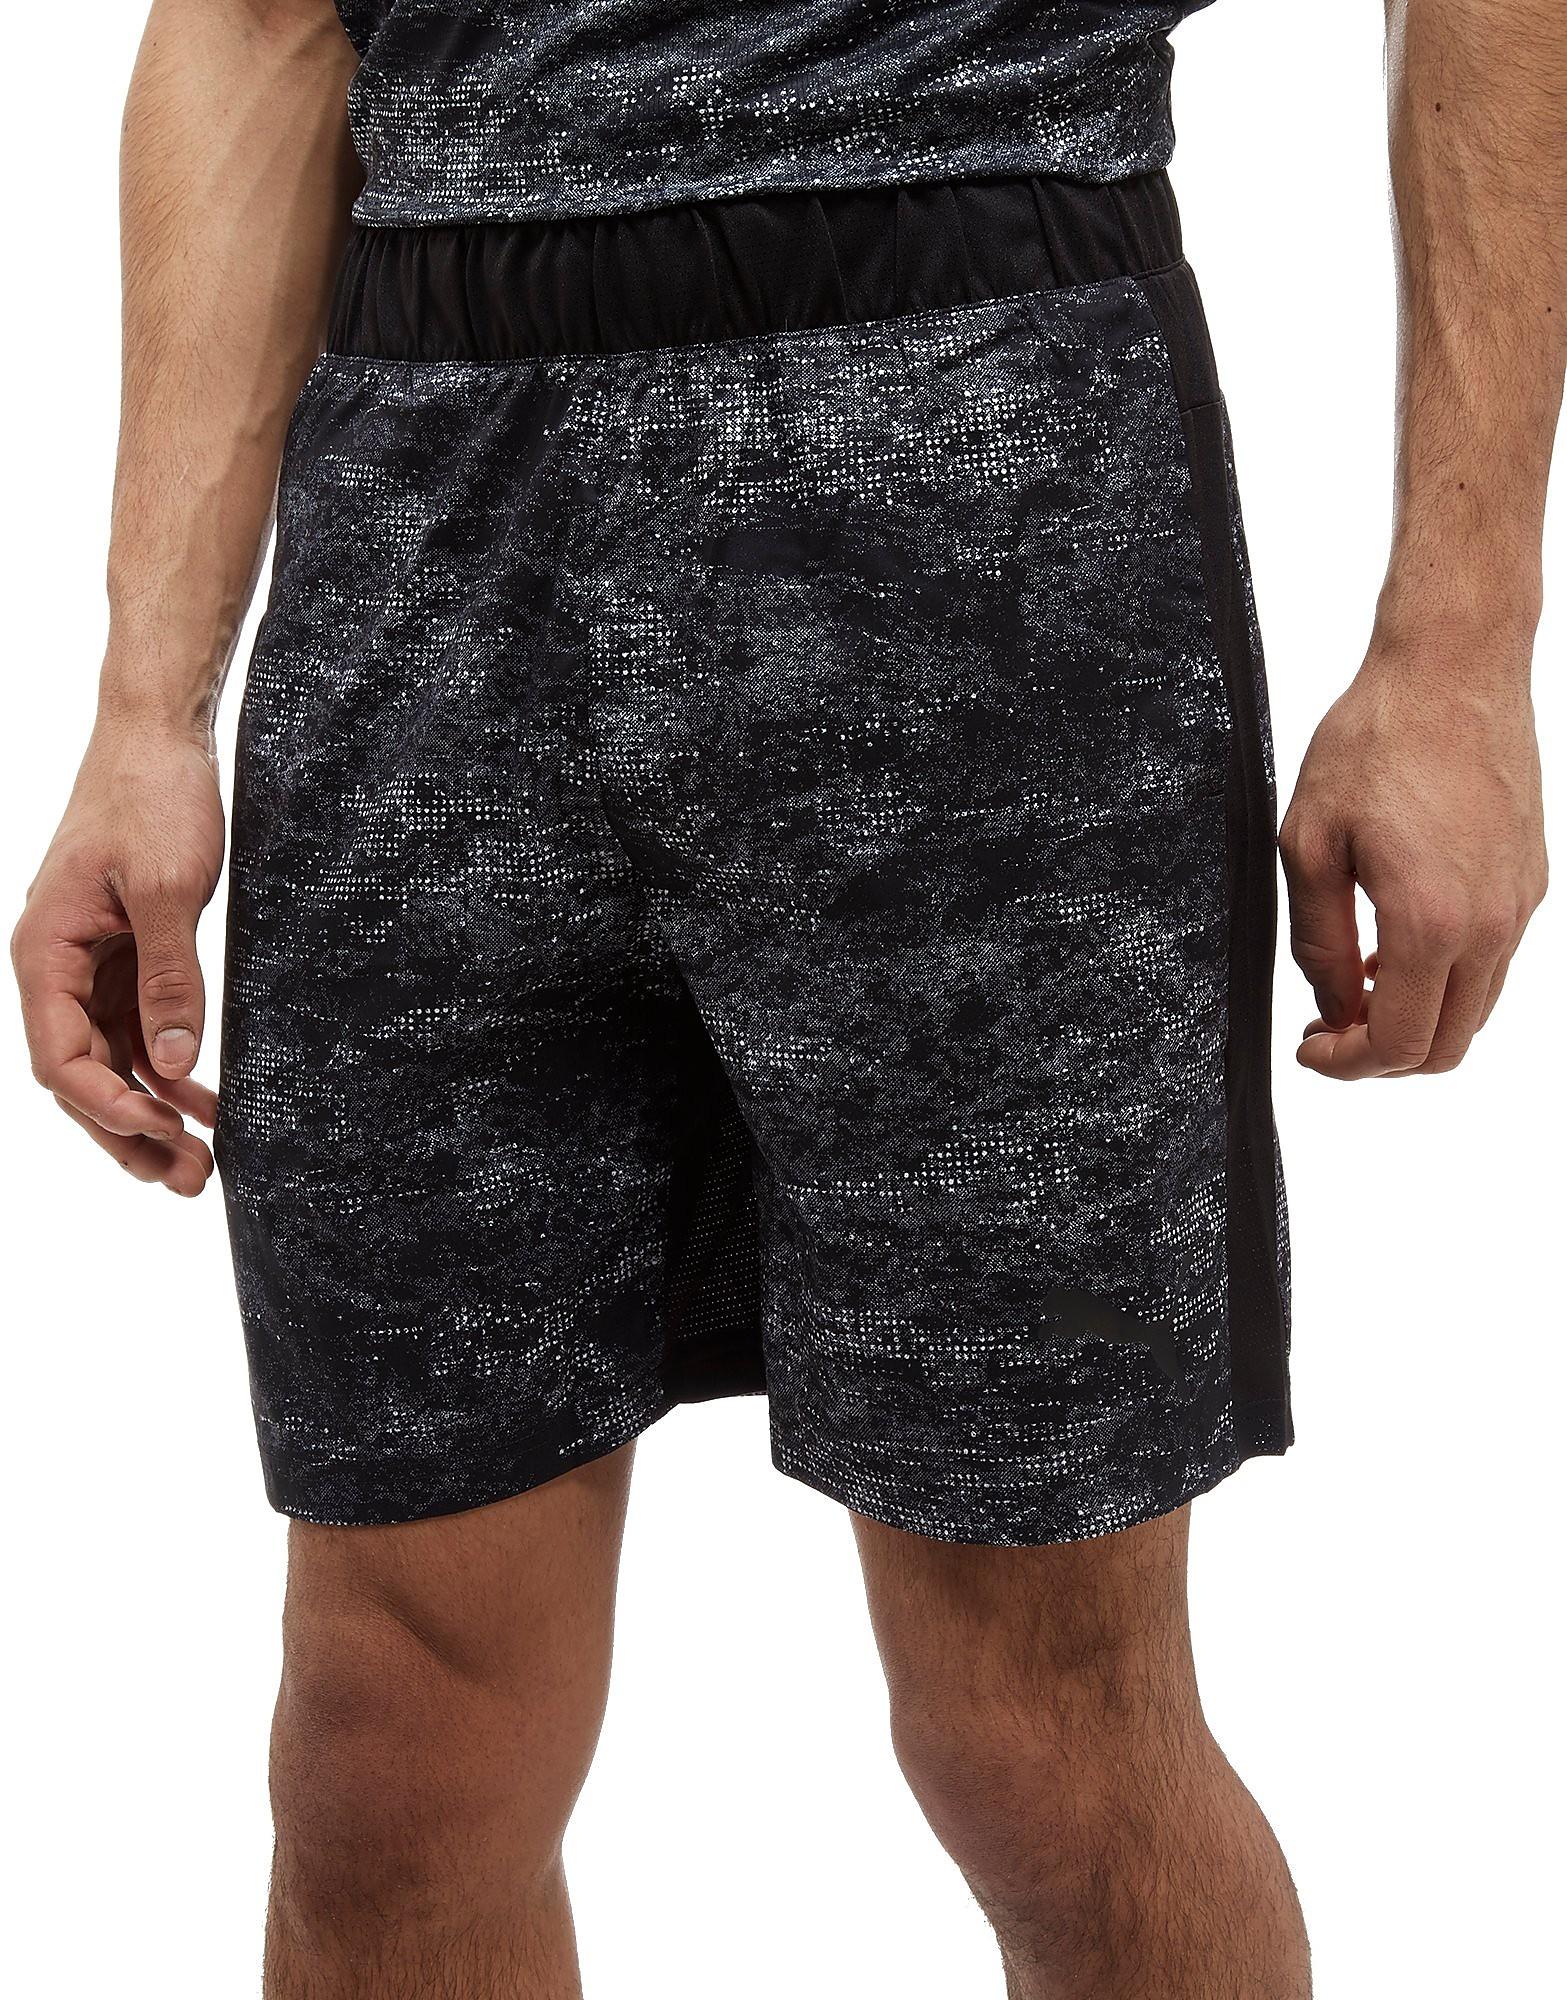 PUMA Camo Woven Shorts